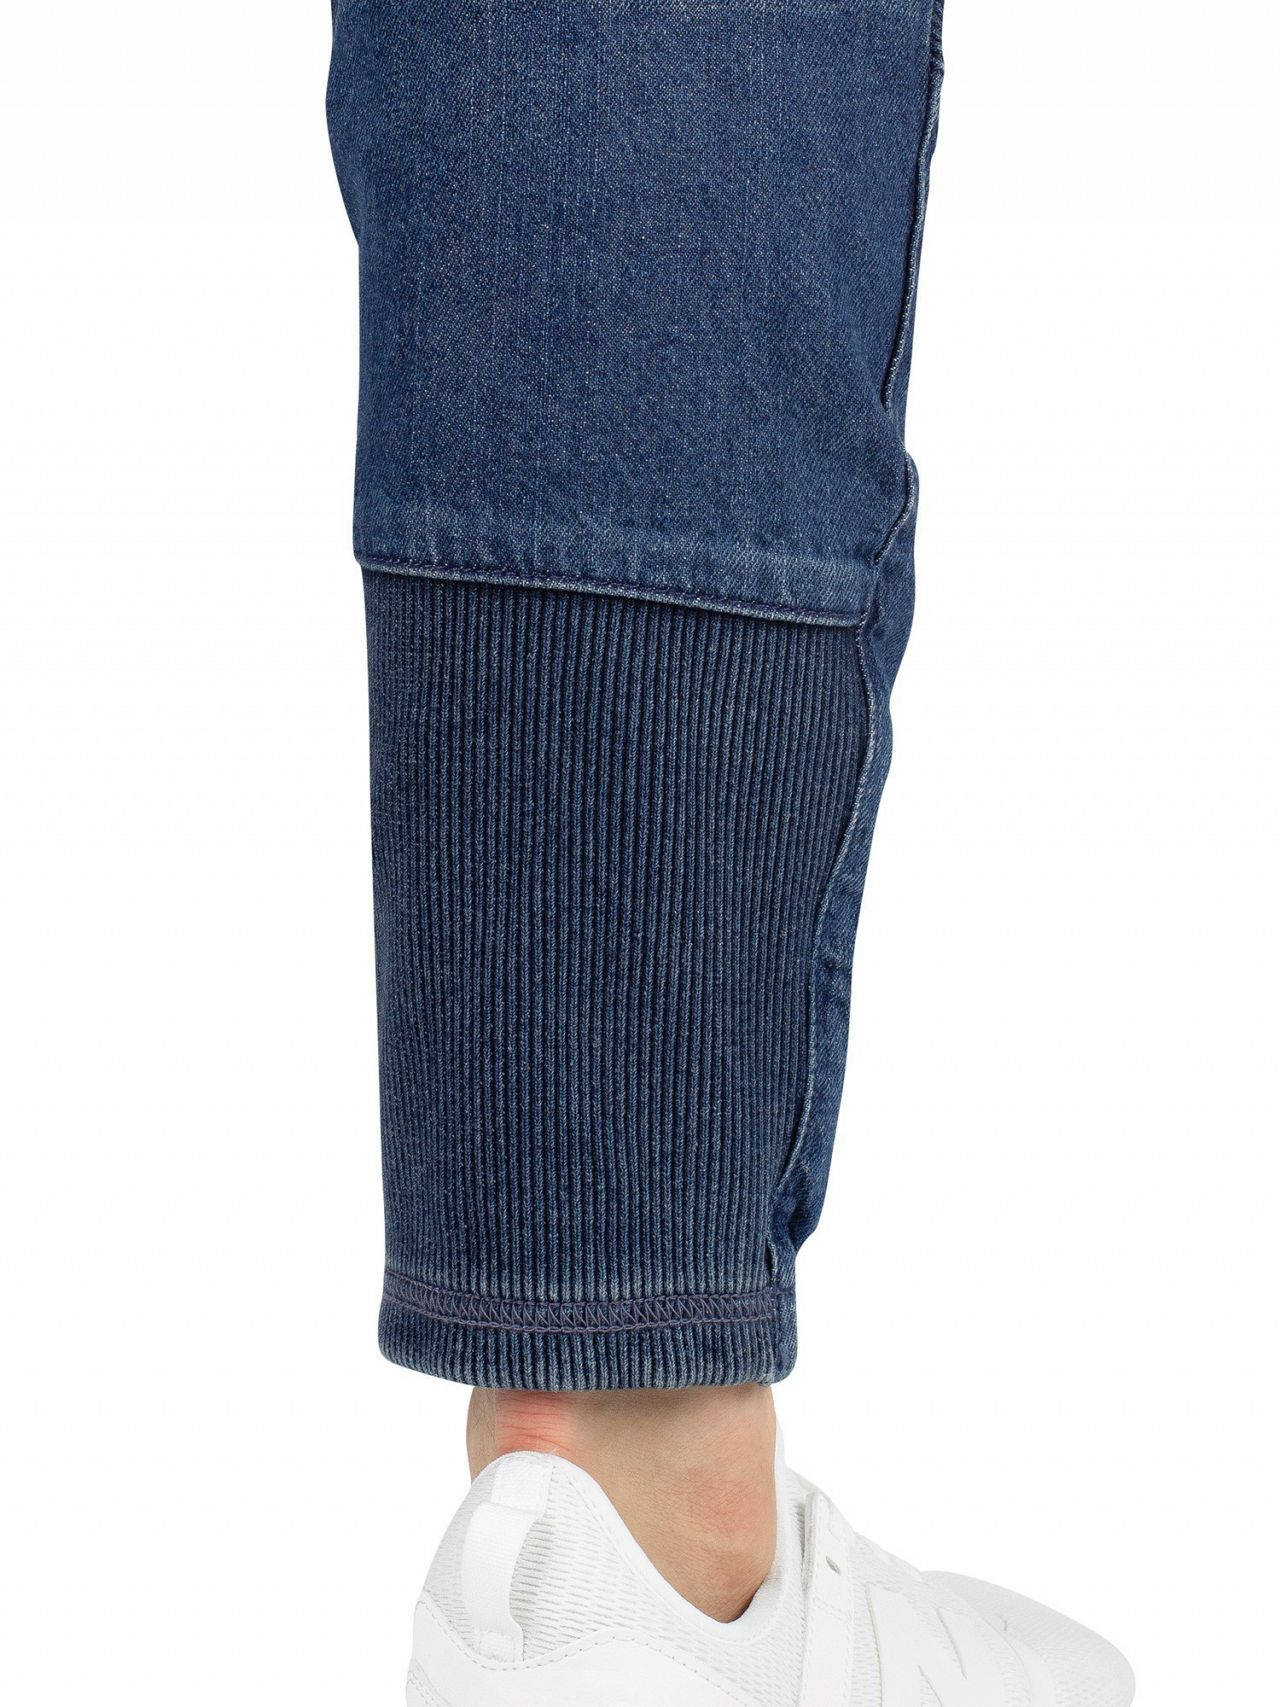 598518e1249 G-Star Blue Motac Deconstructed 3D Slim Jeans | Standout